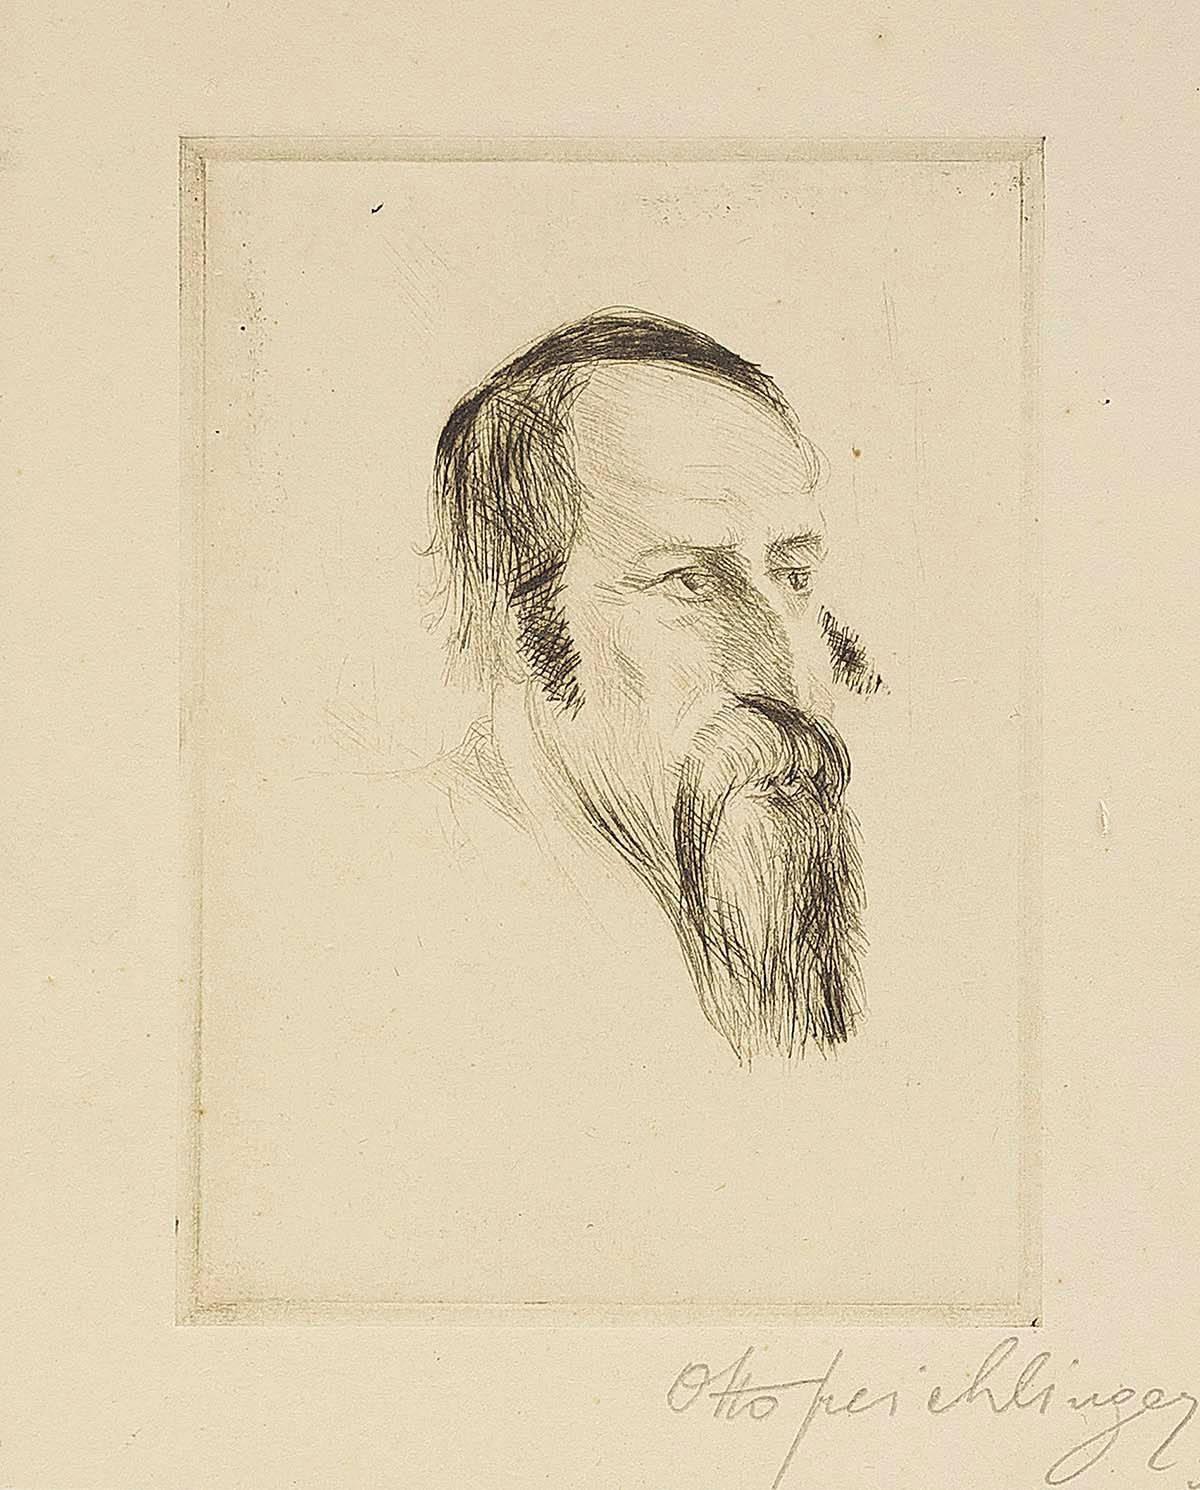 Rabbi (Study), Etching on Paper